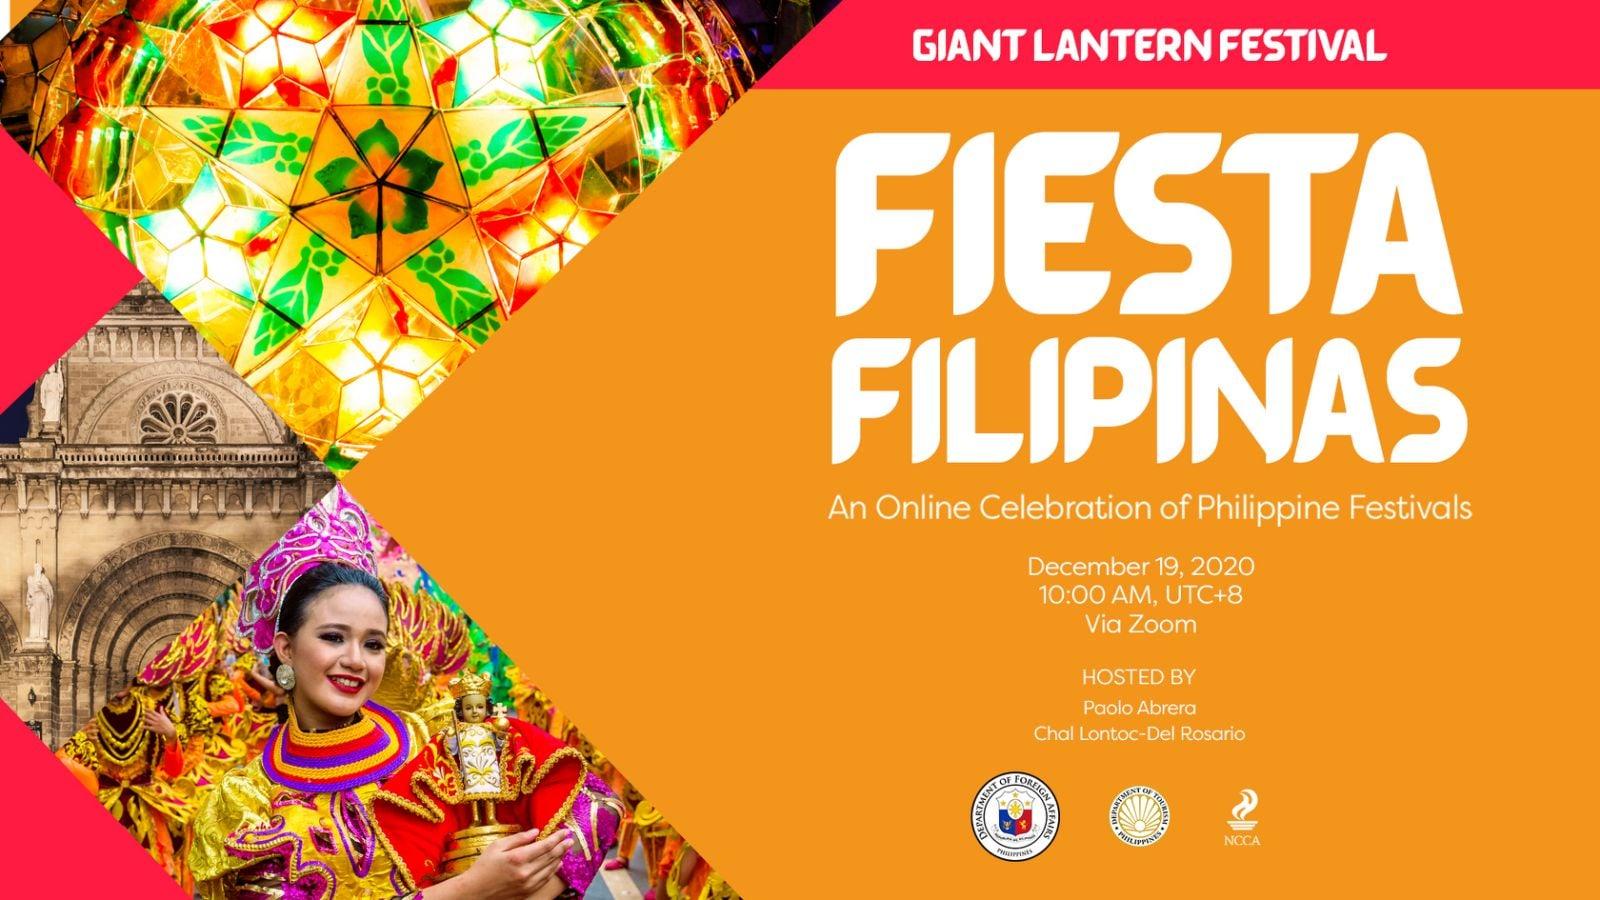 #FiestaFilipinas Giant Lantern Festival LIVE!